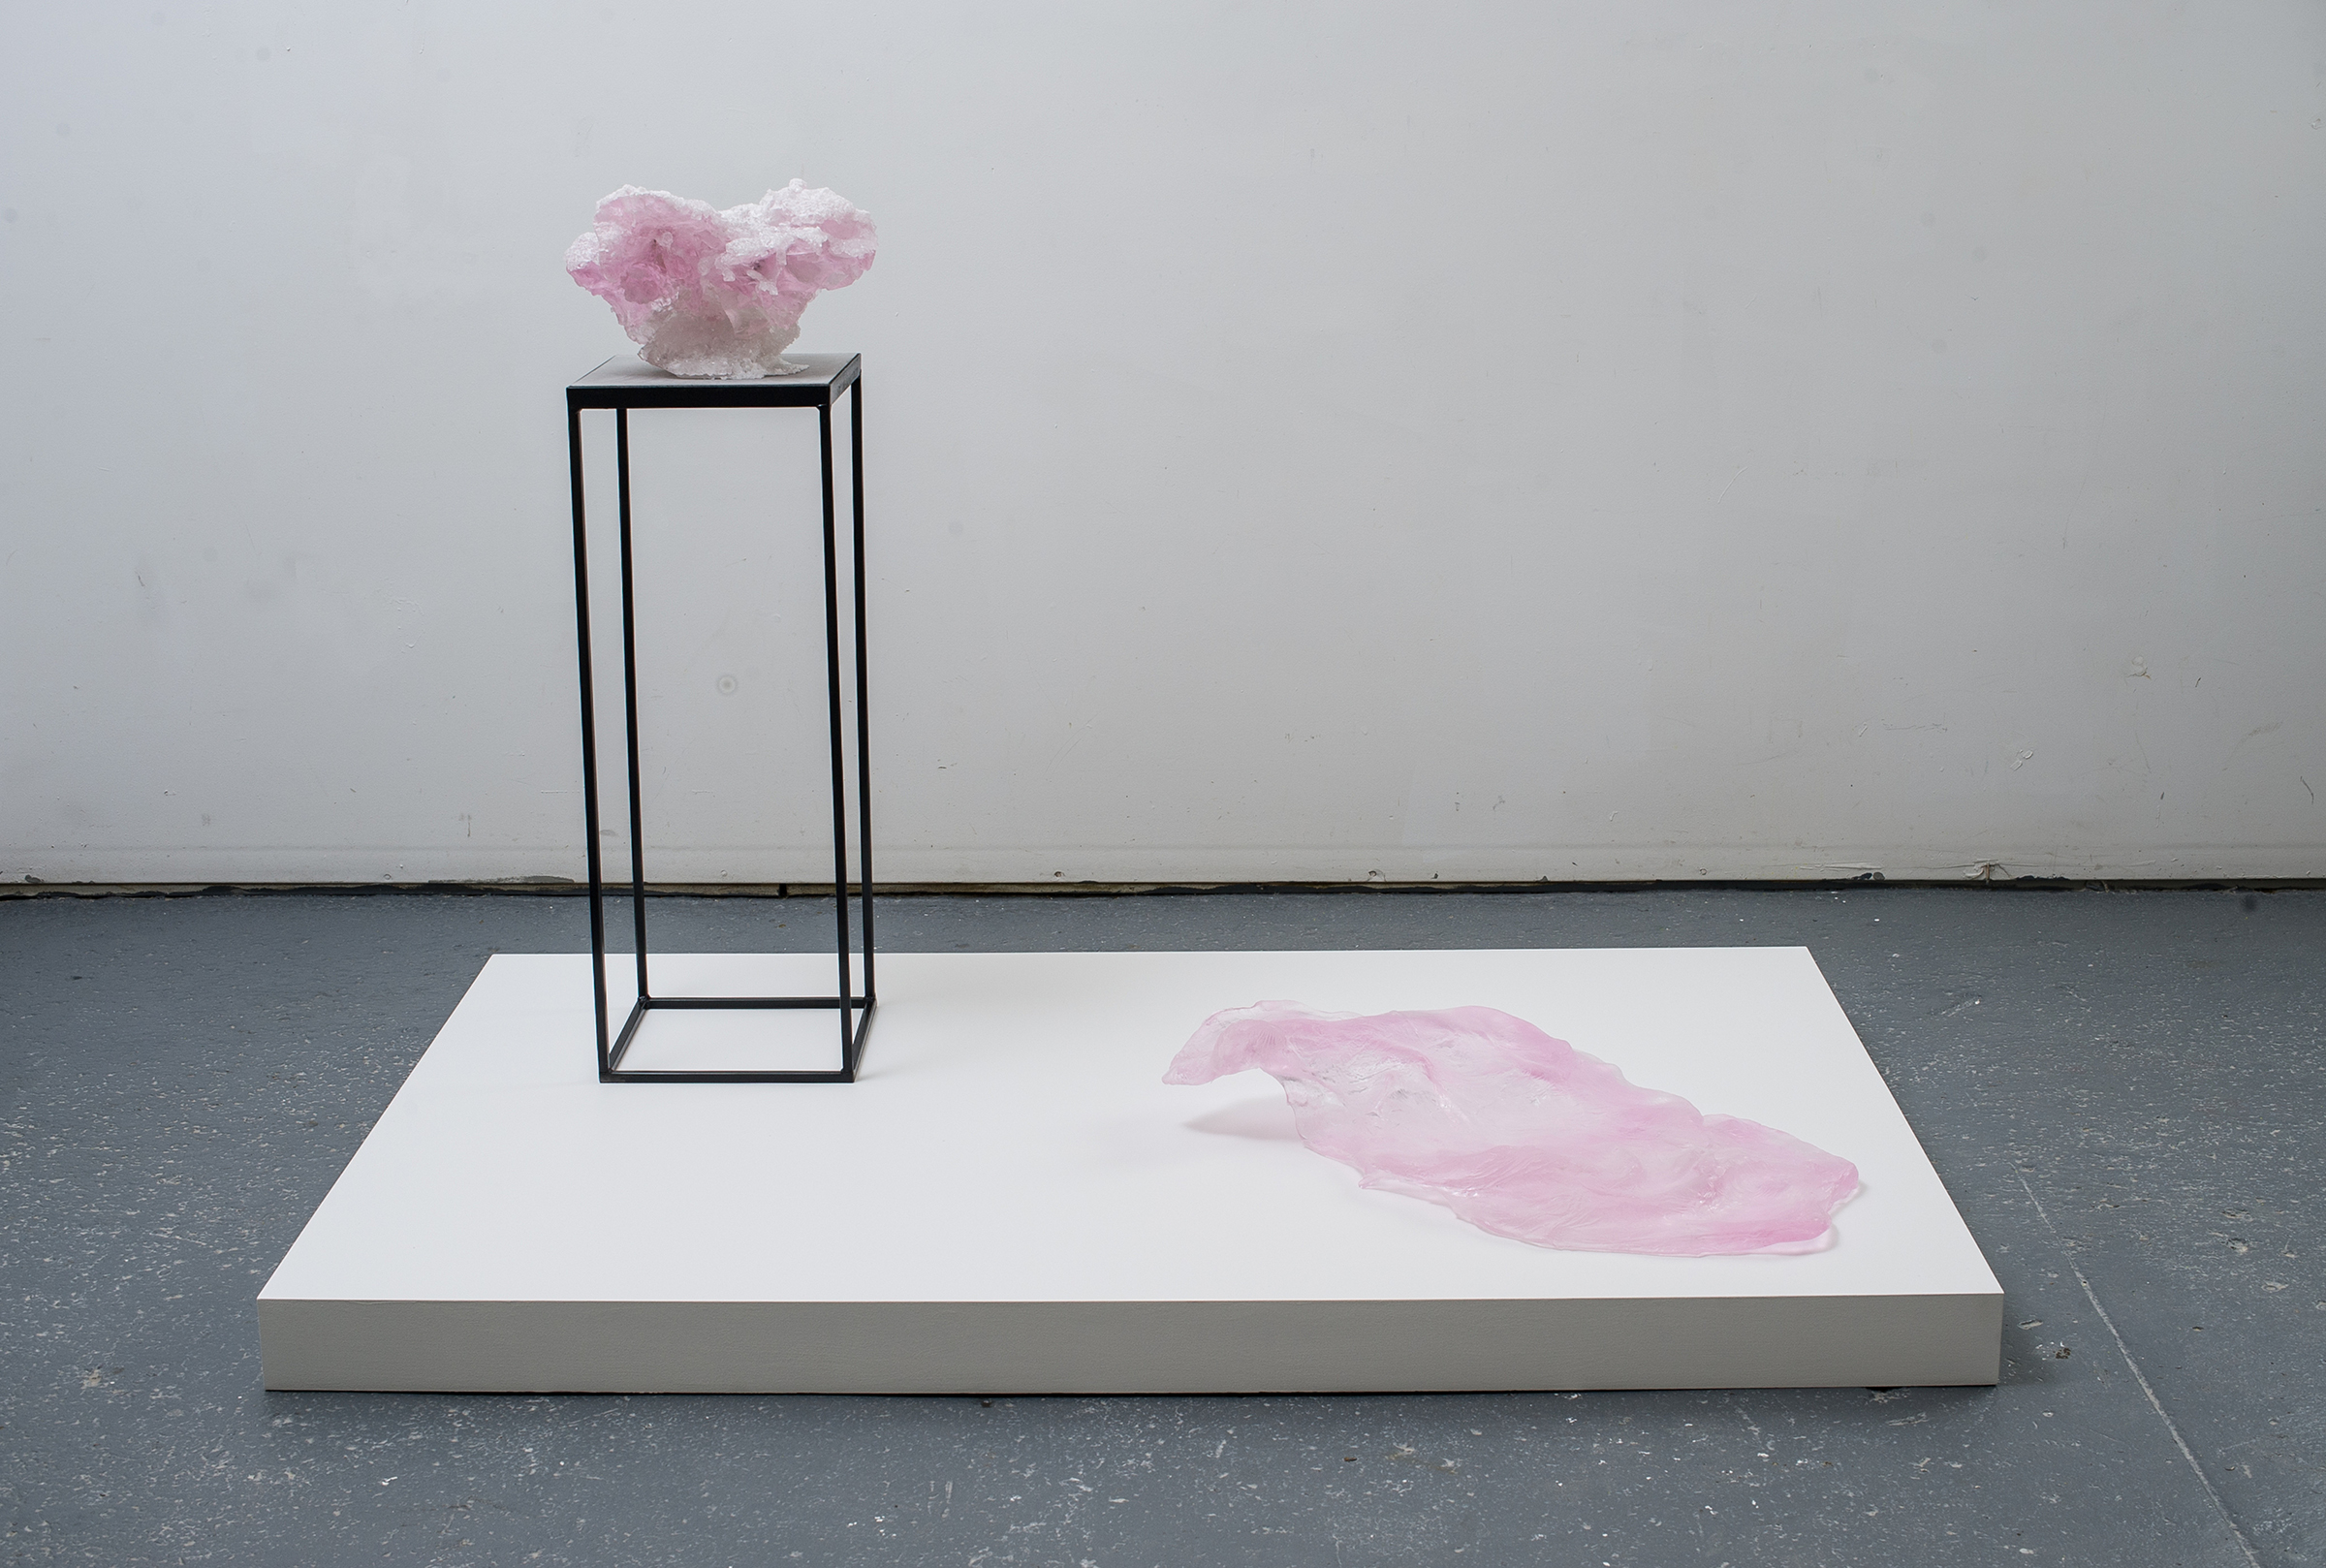 Problematica (Pink Slump/Pink Crystal)